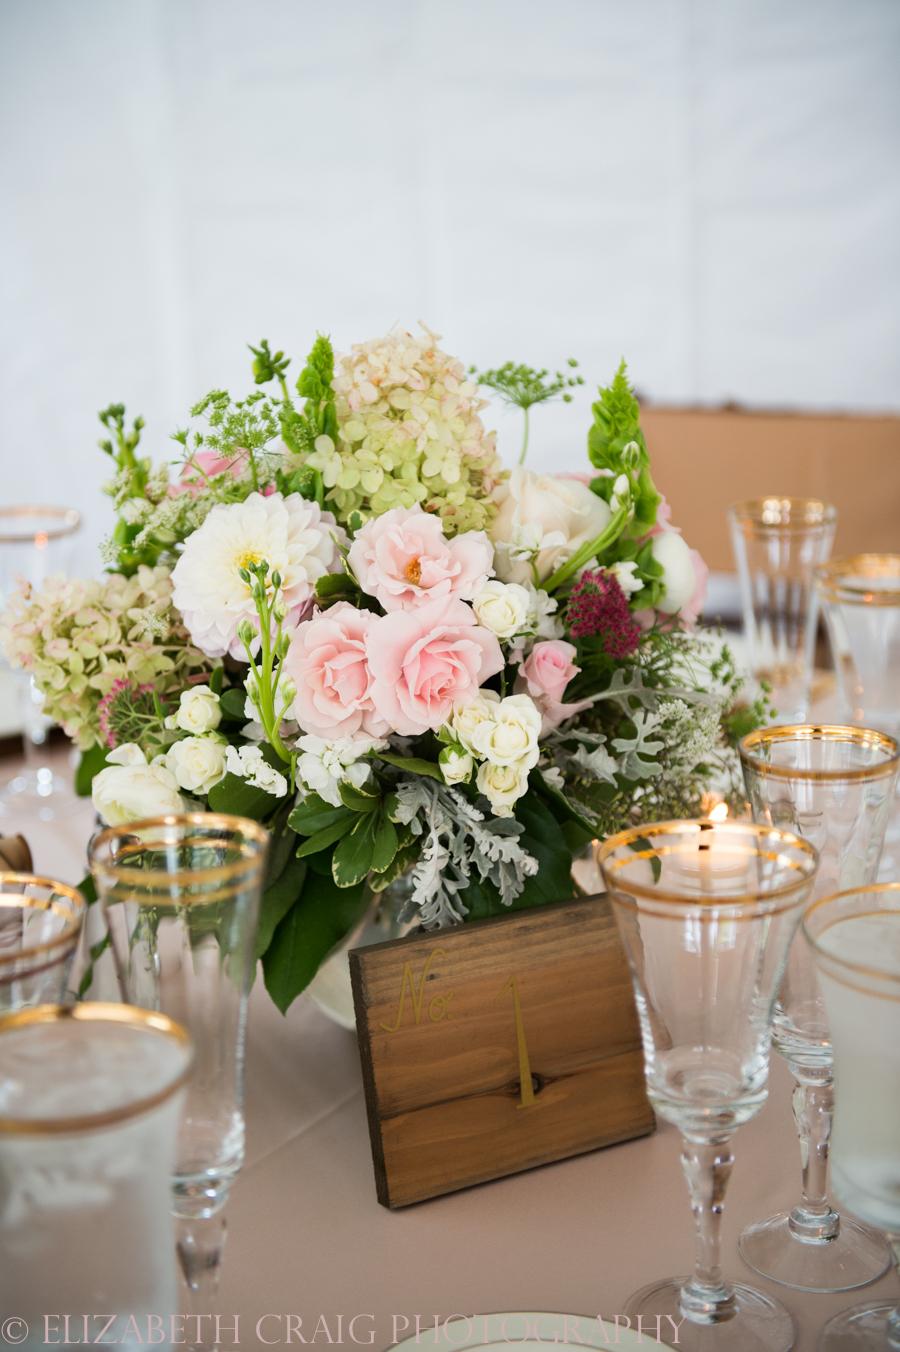 Dubois Brockway St. Marys PA Weddings-0181